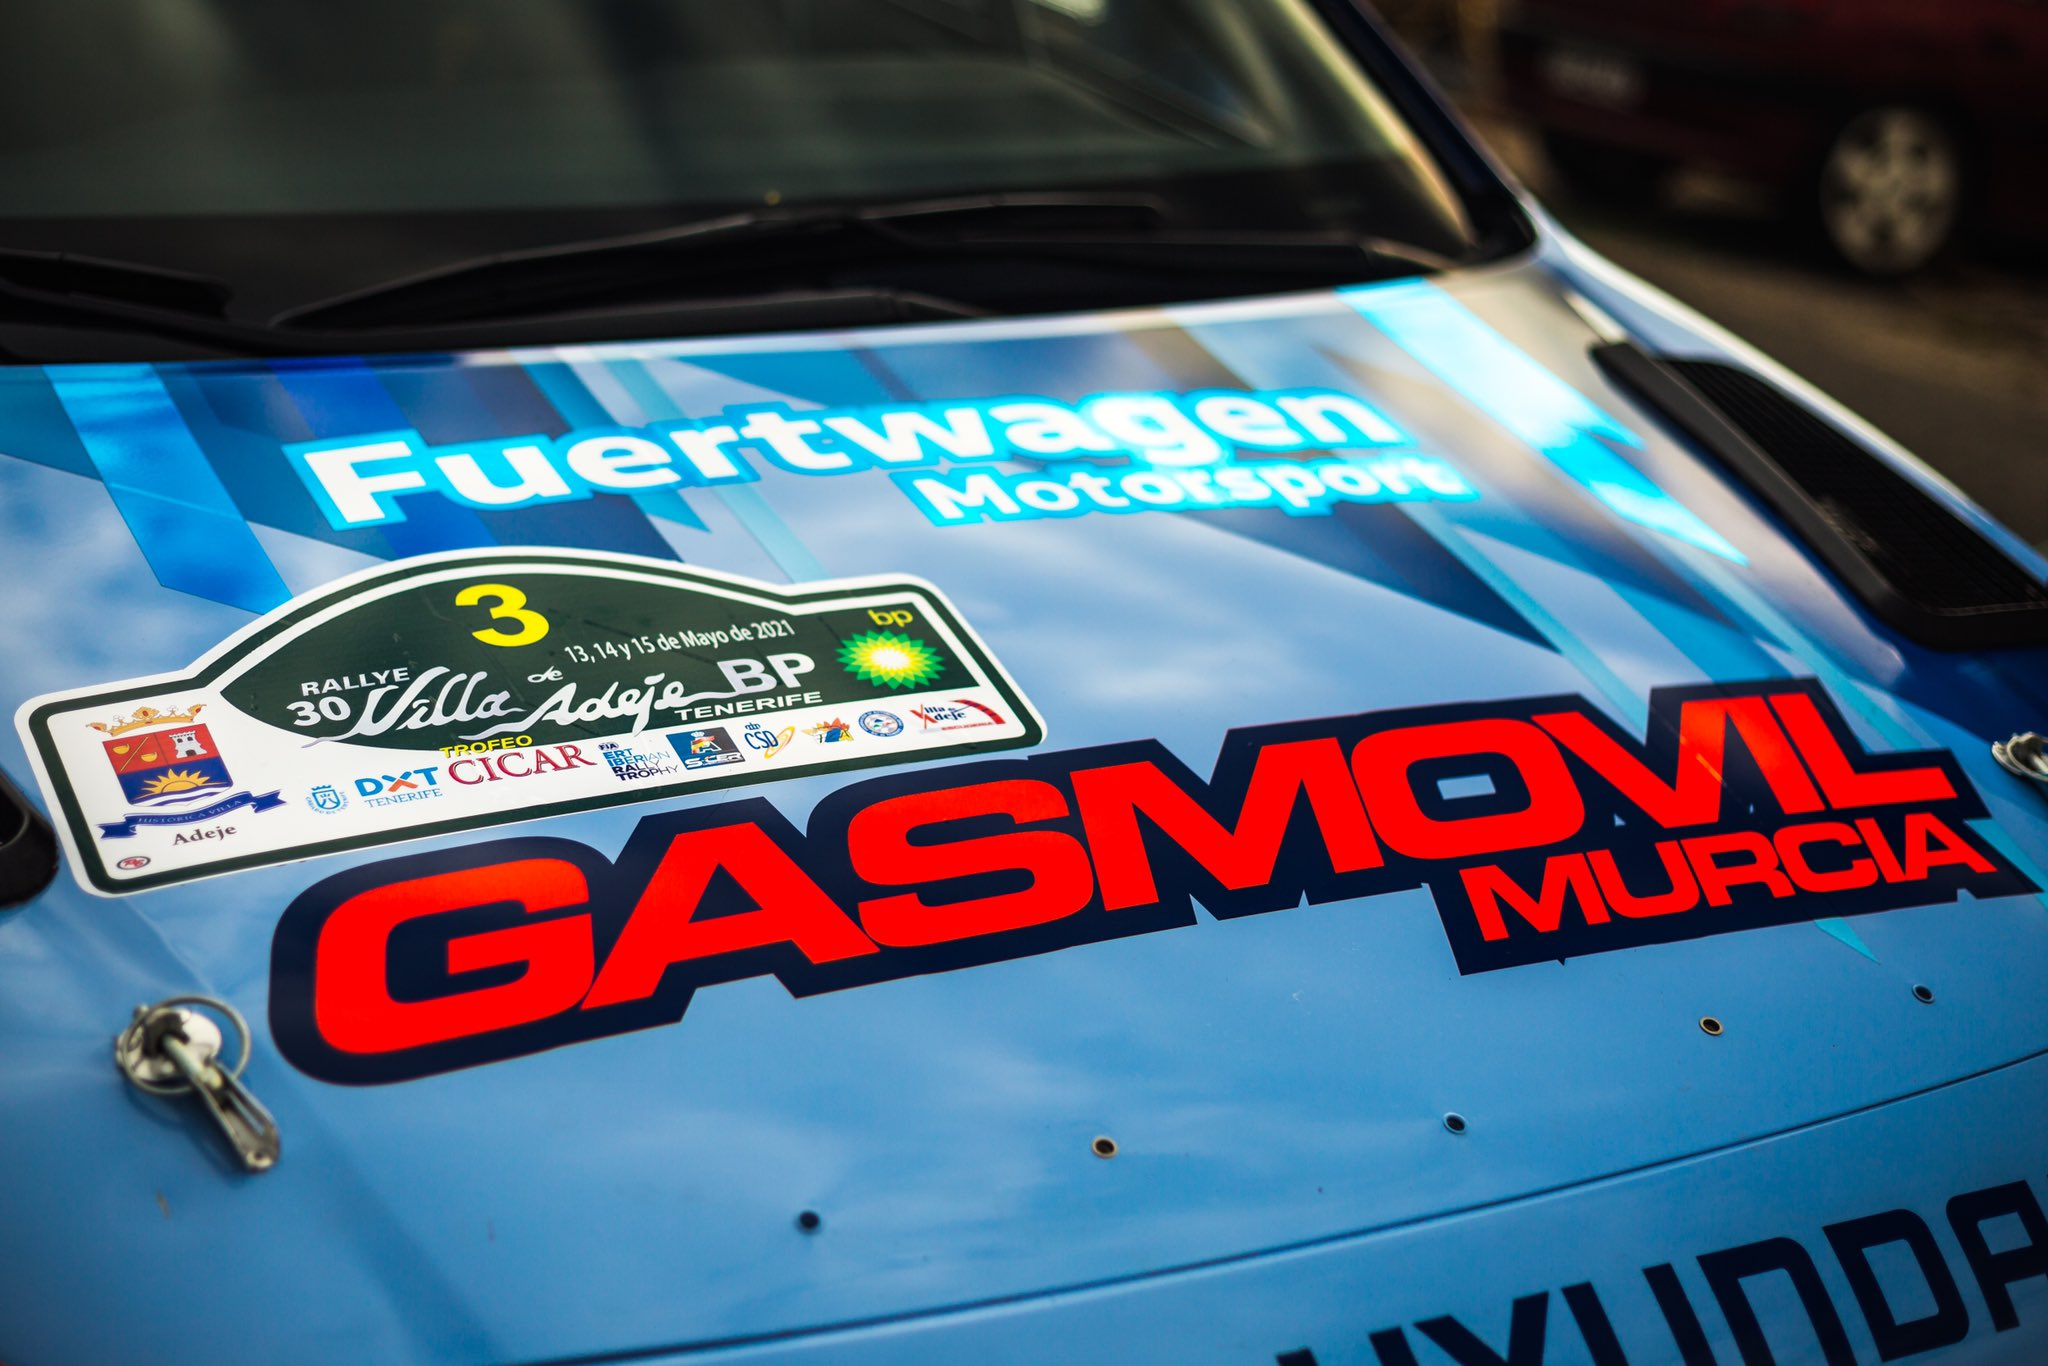 SCER: 30º Rallye Villa de Adeje BP Tenerife - Trofeo Cicar [13-15 Mayo] - Página 2 E1WOtMTXsAQ-5jy?format=jpg&name=large